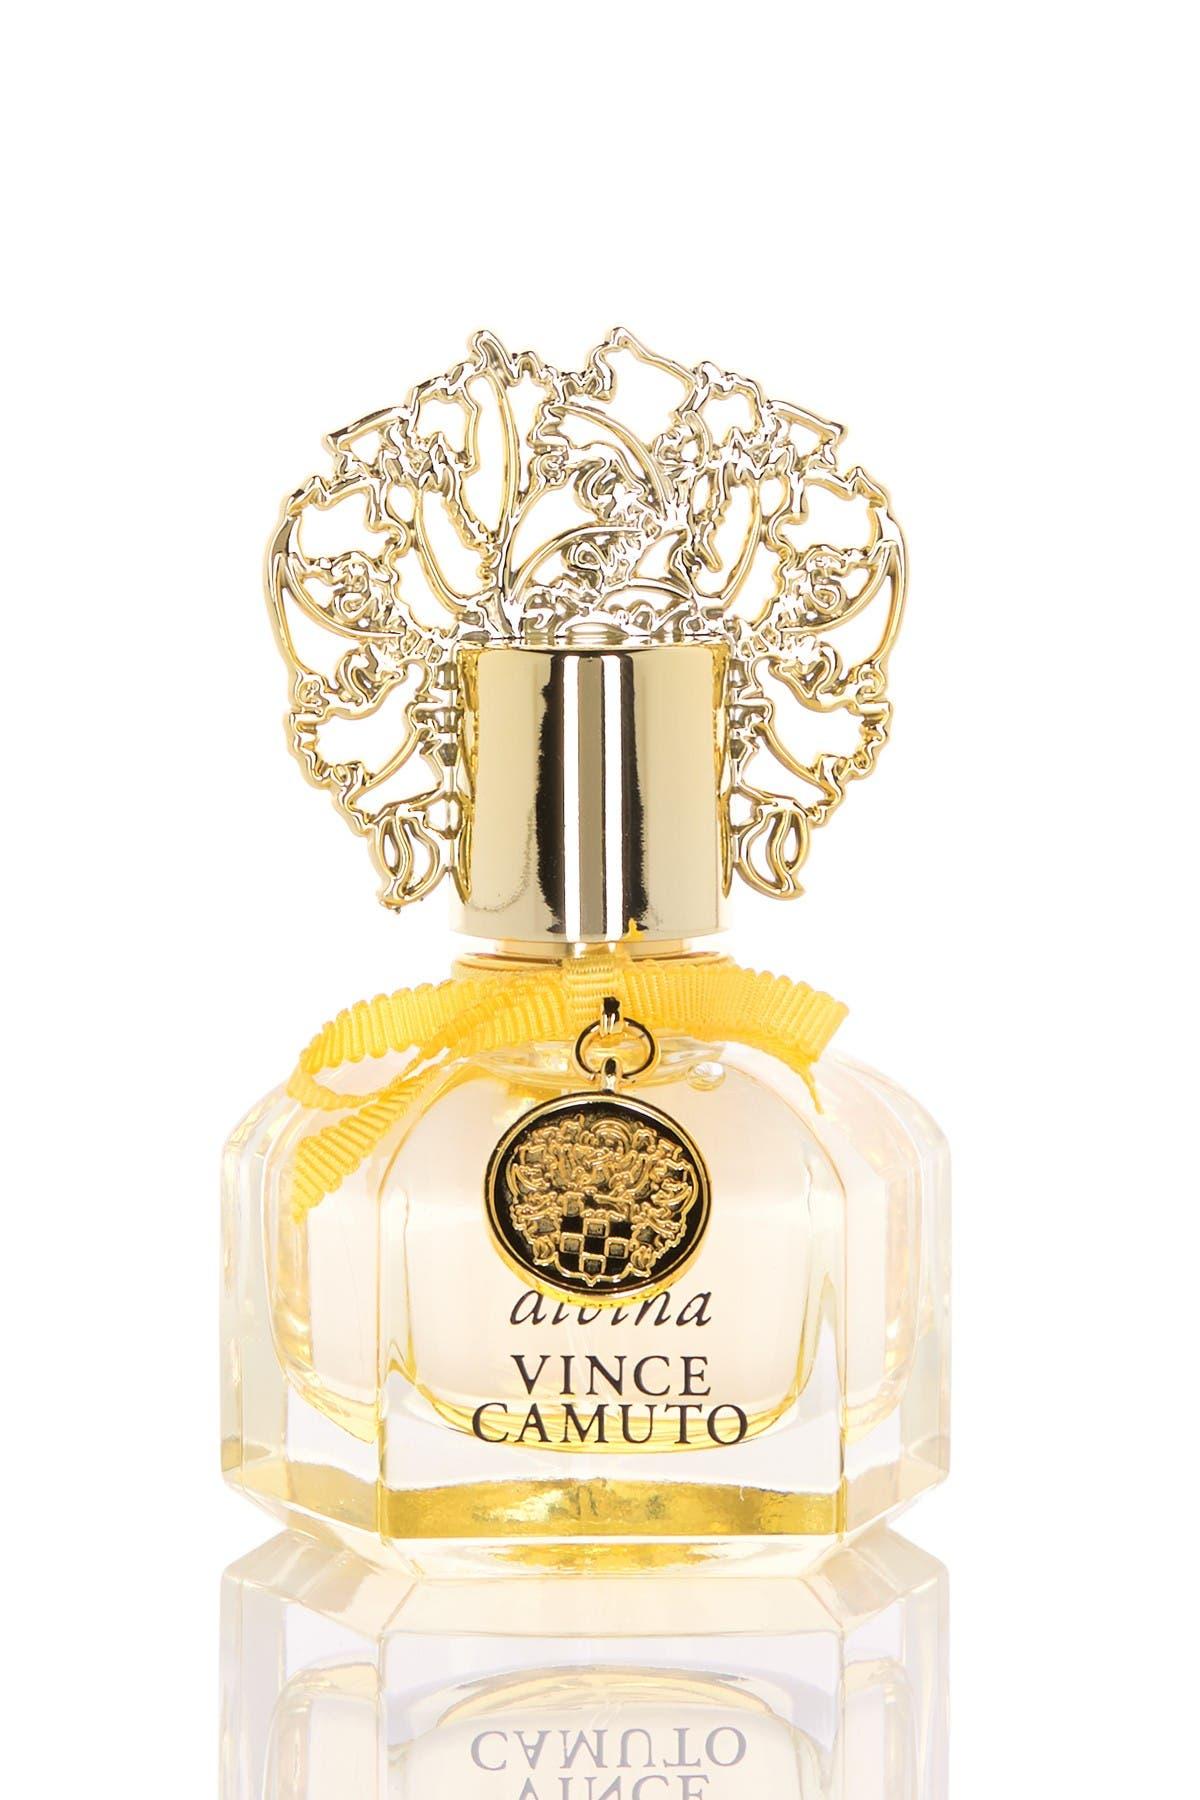 Image of Vince Camuto Divina Eau de Parfum Spray - 1.0 fl oz.